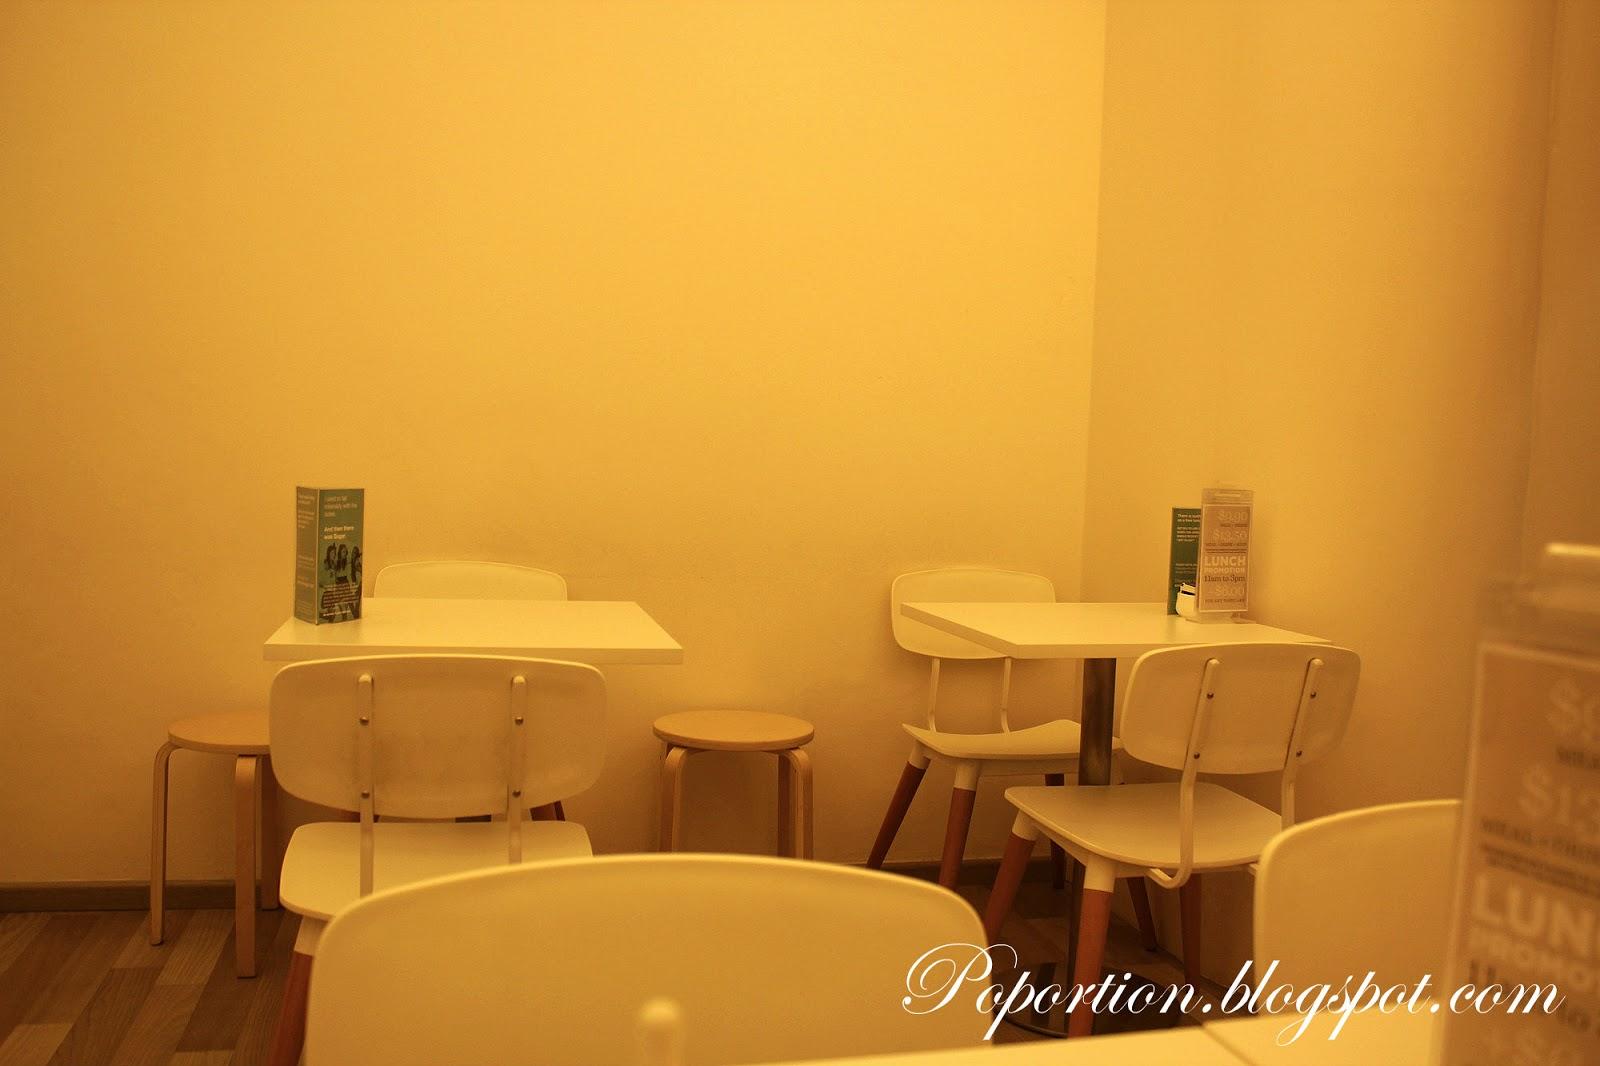 best tart cafe singapore cafe interior